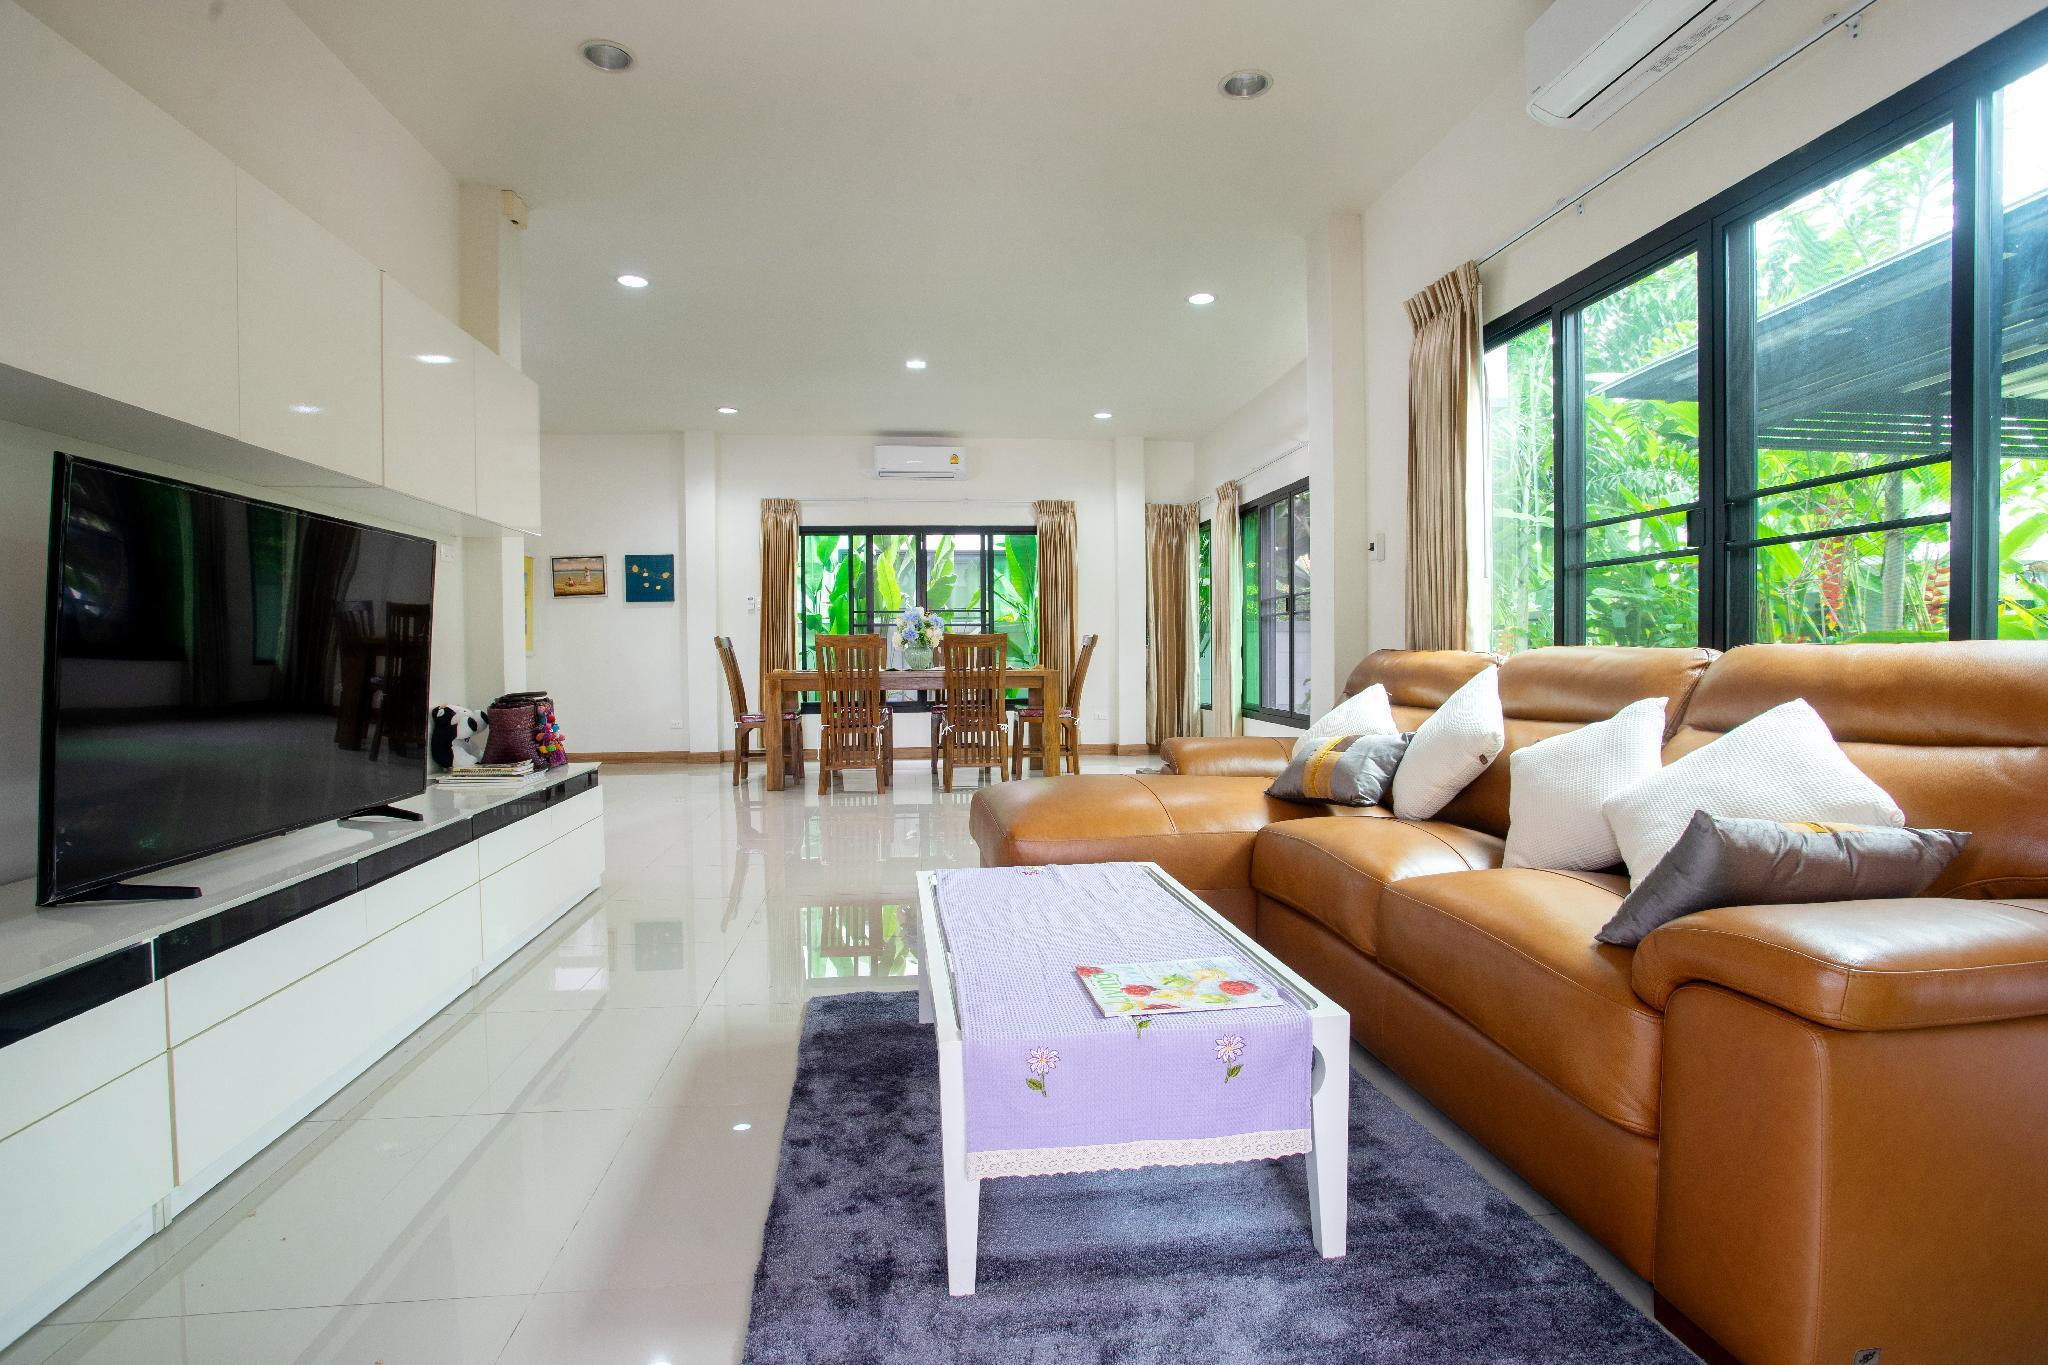 New Private Luxurious Villa near Kad Farang บ้านเดี่ยว 3 ห้องนอน 4 ห้องน้ำส่วนตัว ขนาด 280 ตร.ม. – หางดง